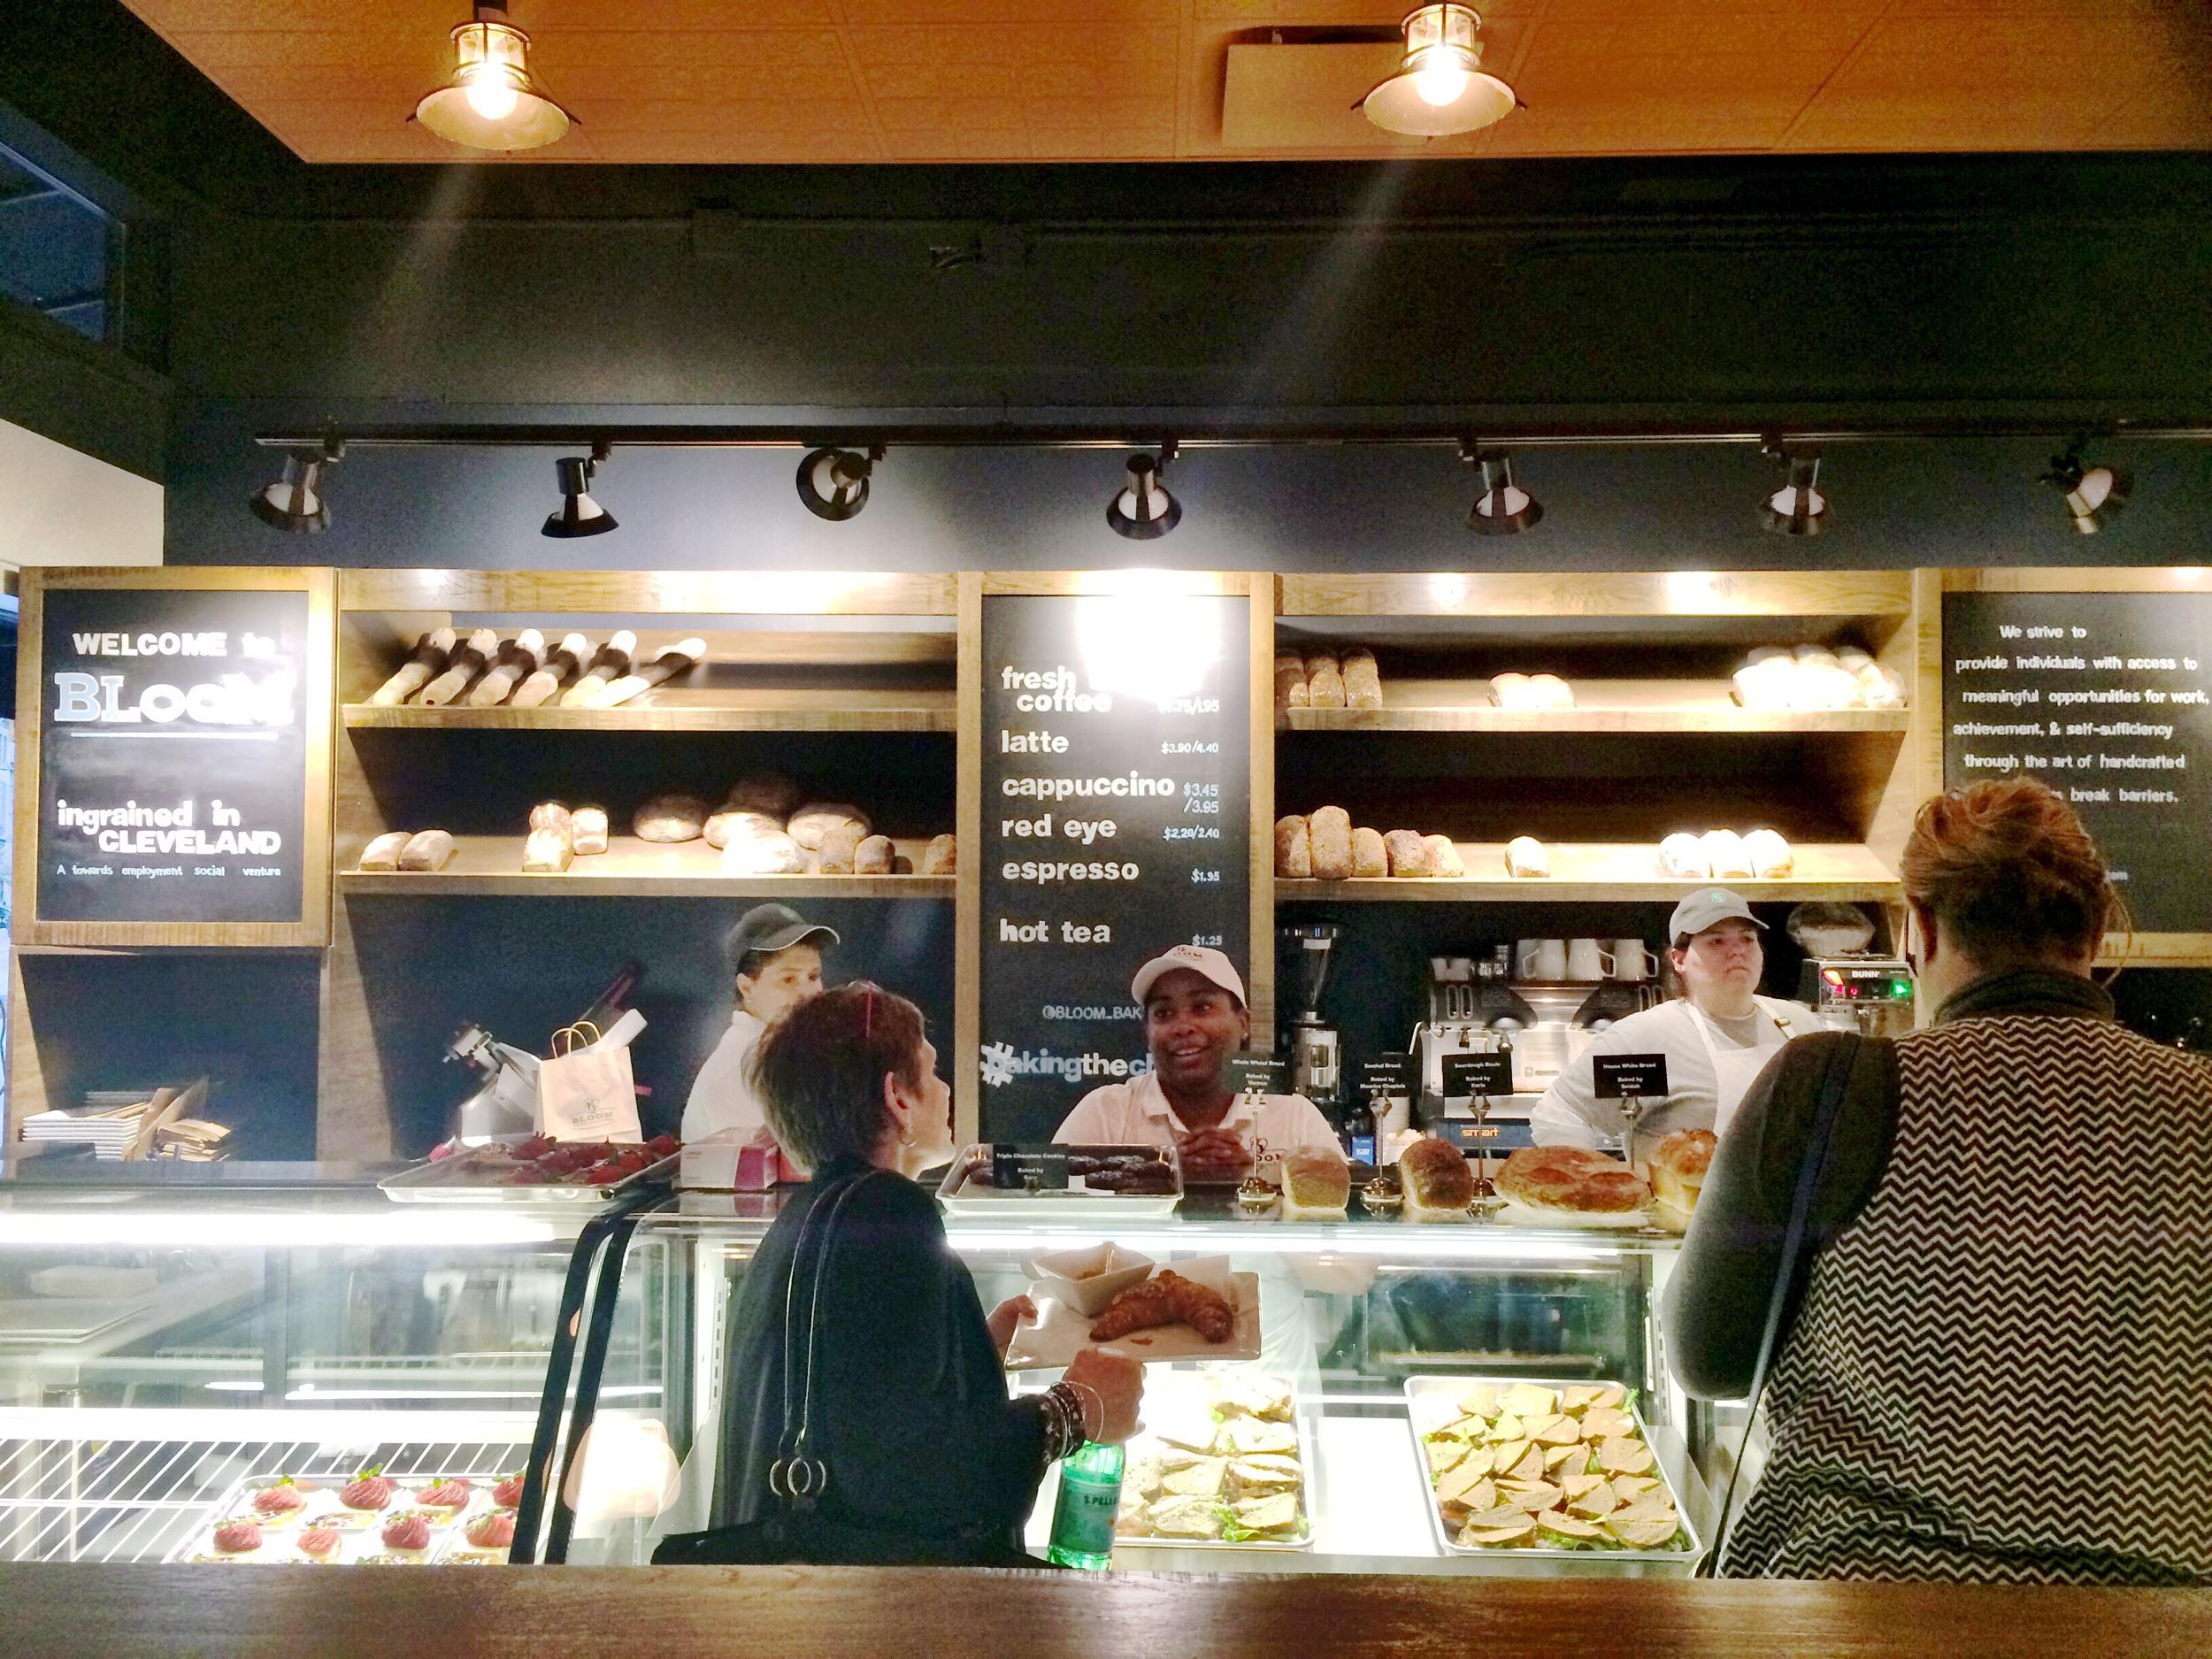 Saidah Farrell behind the counter slinging incredible pastry samples.